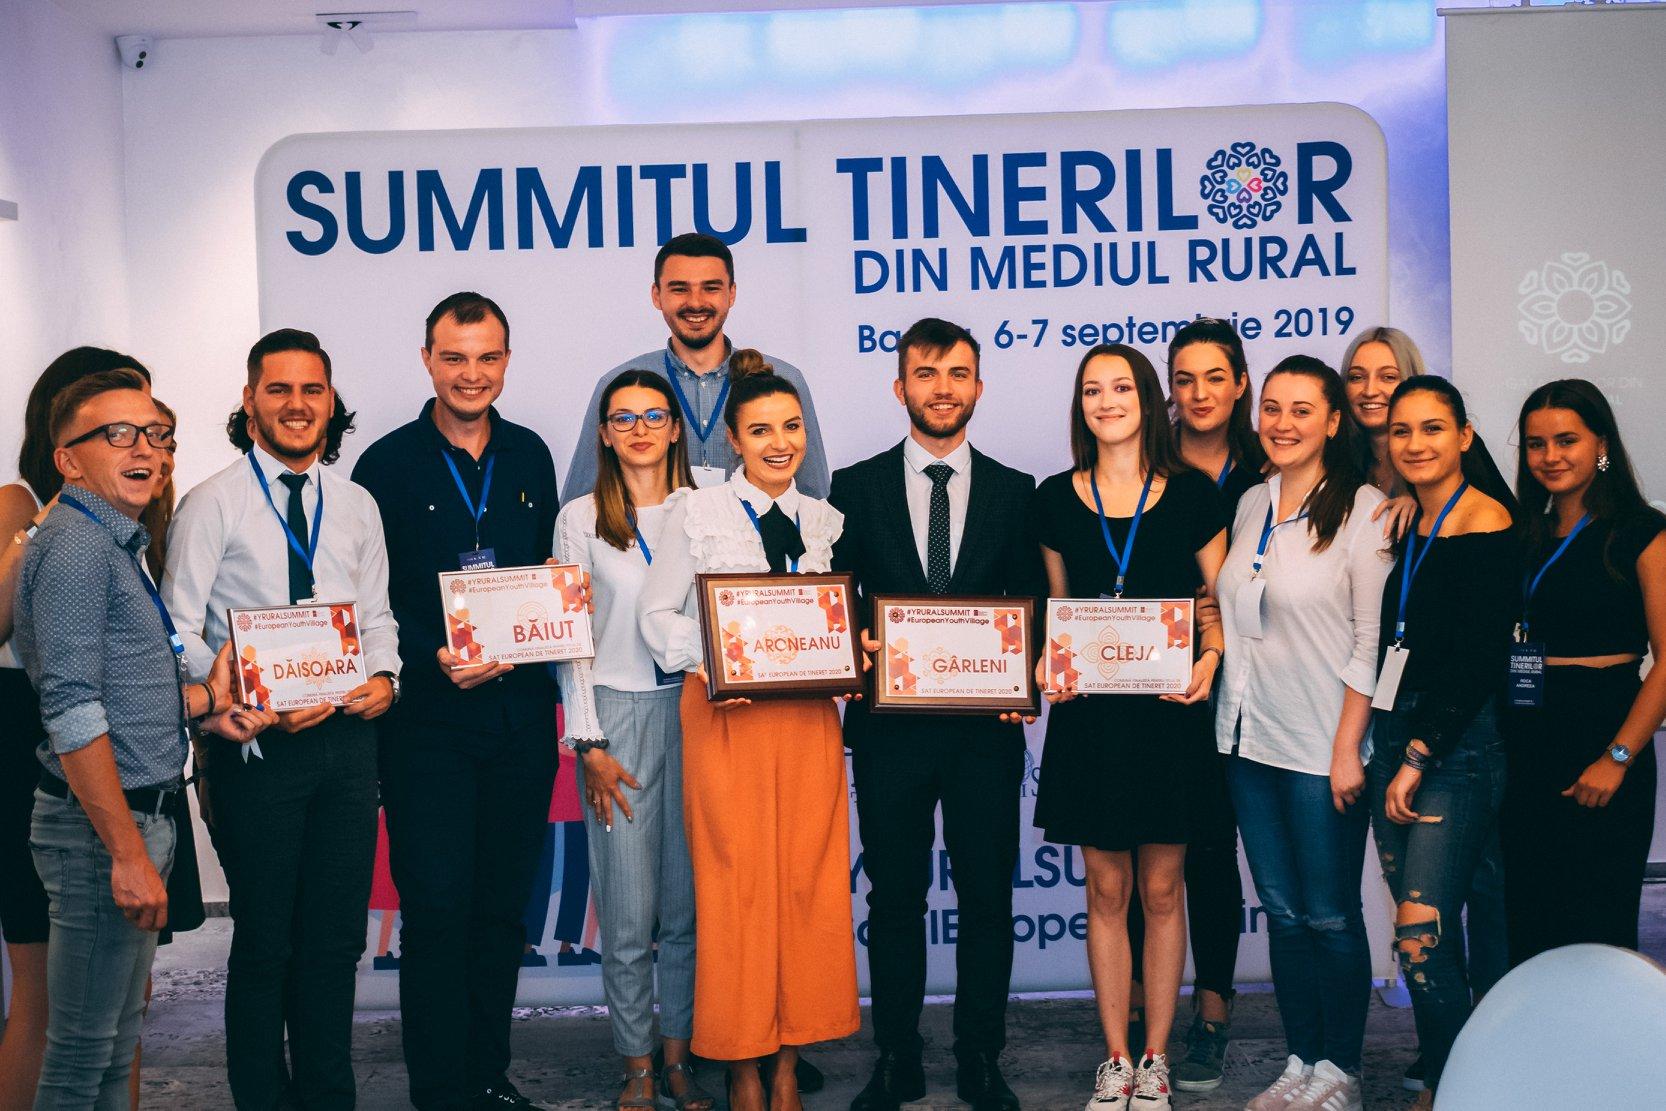 Tinerii din mediul rural își construiesc o mișcare de tineret la nivel național